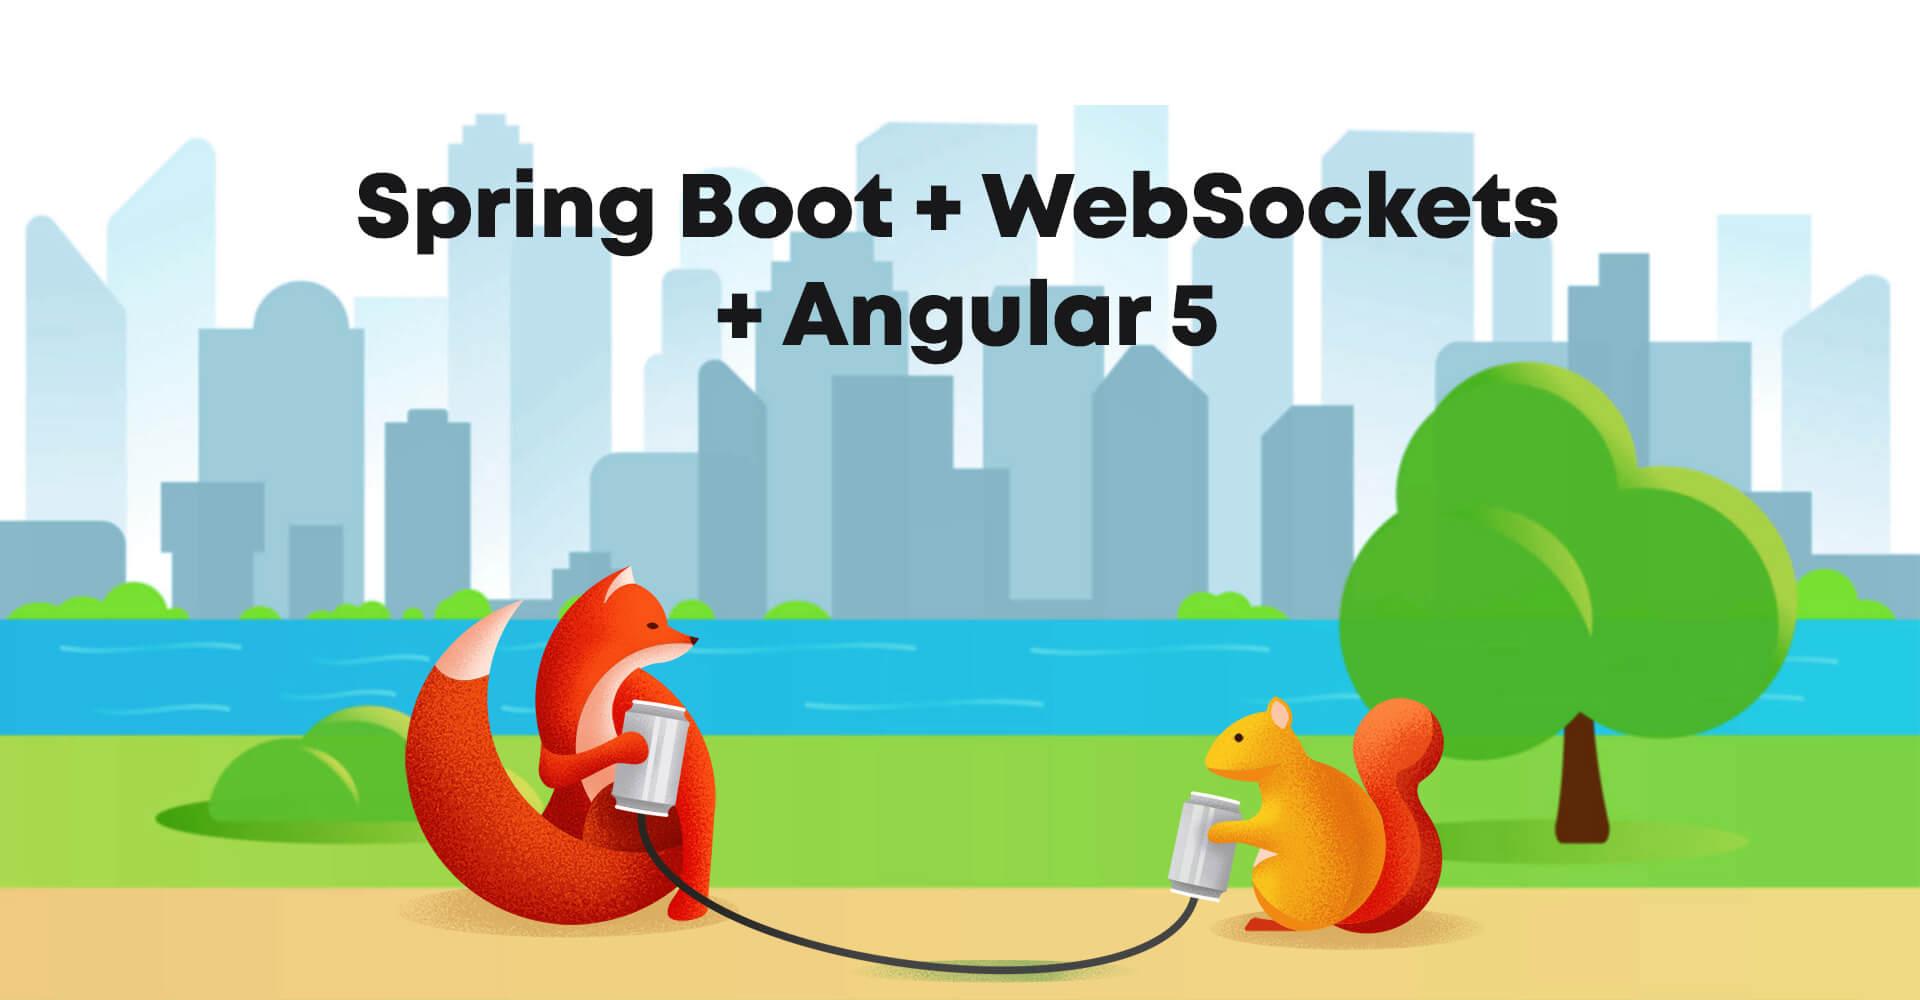 Spring Boot + WebSockets + Angular 5